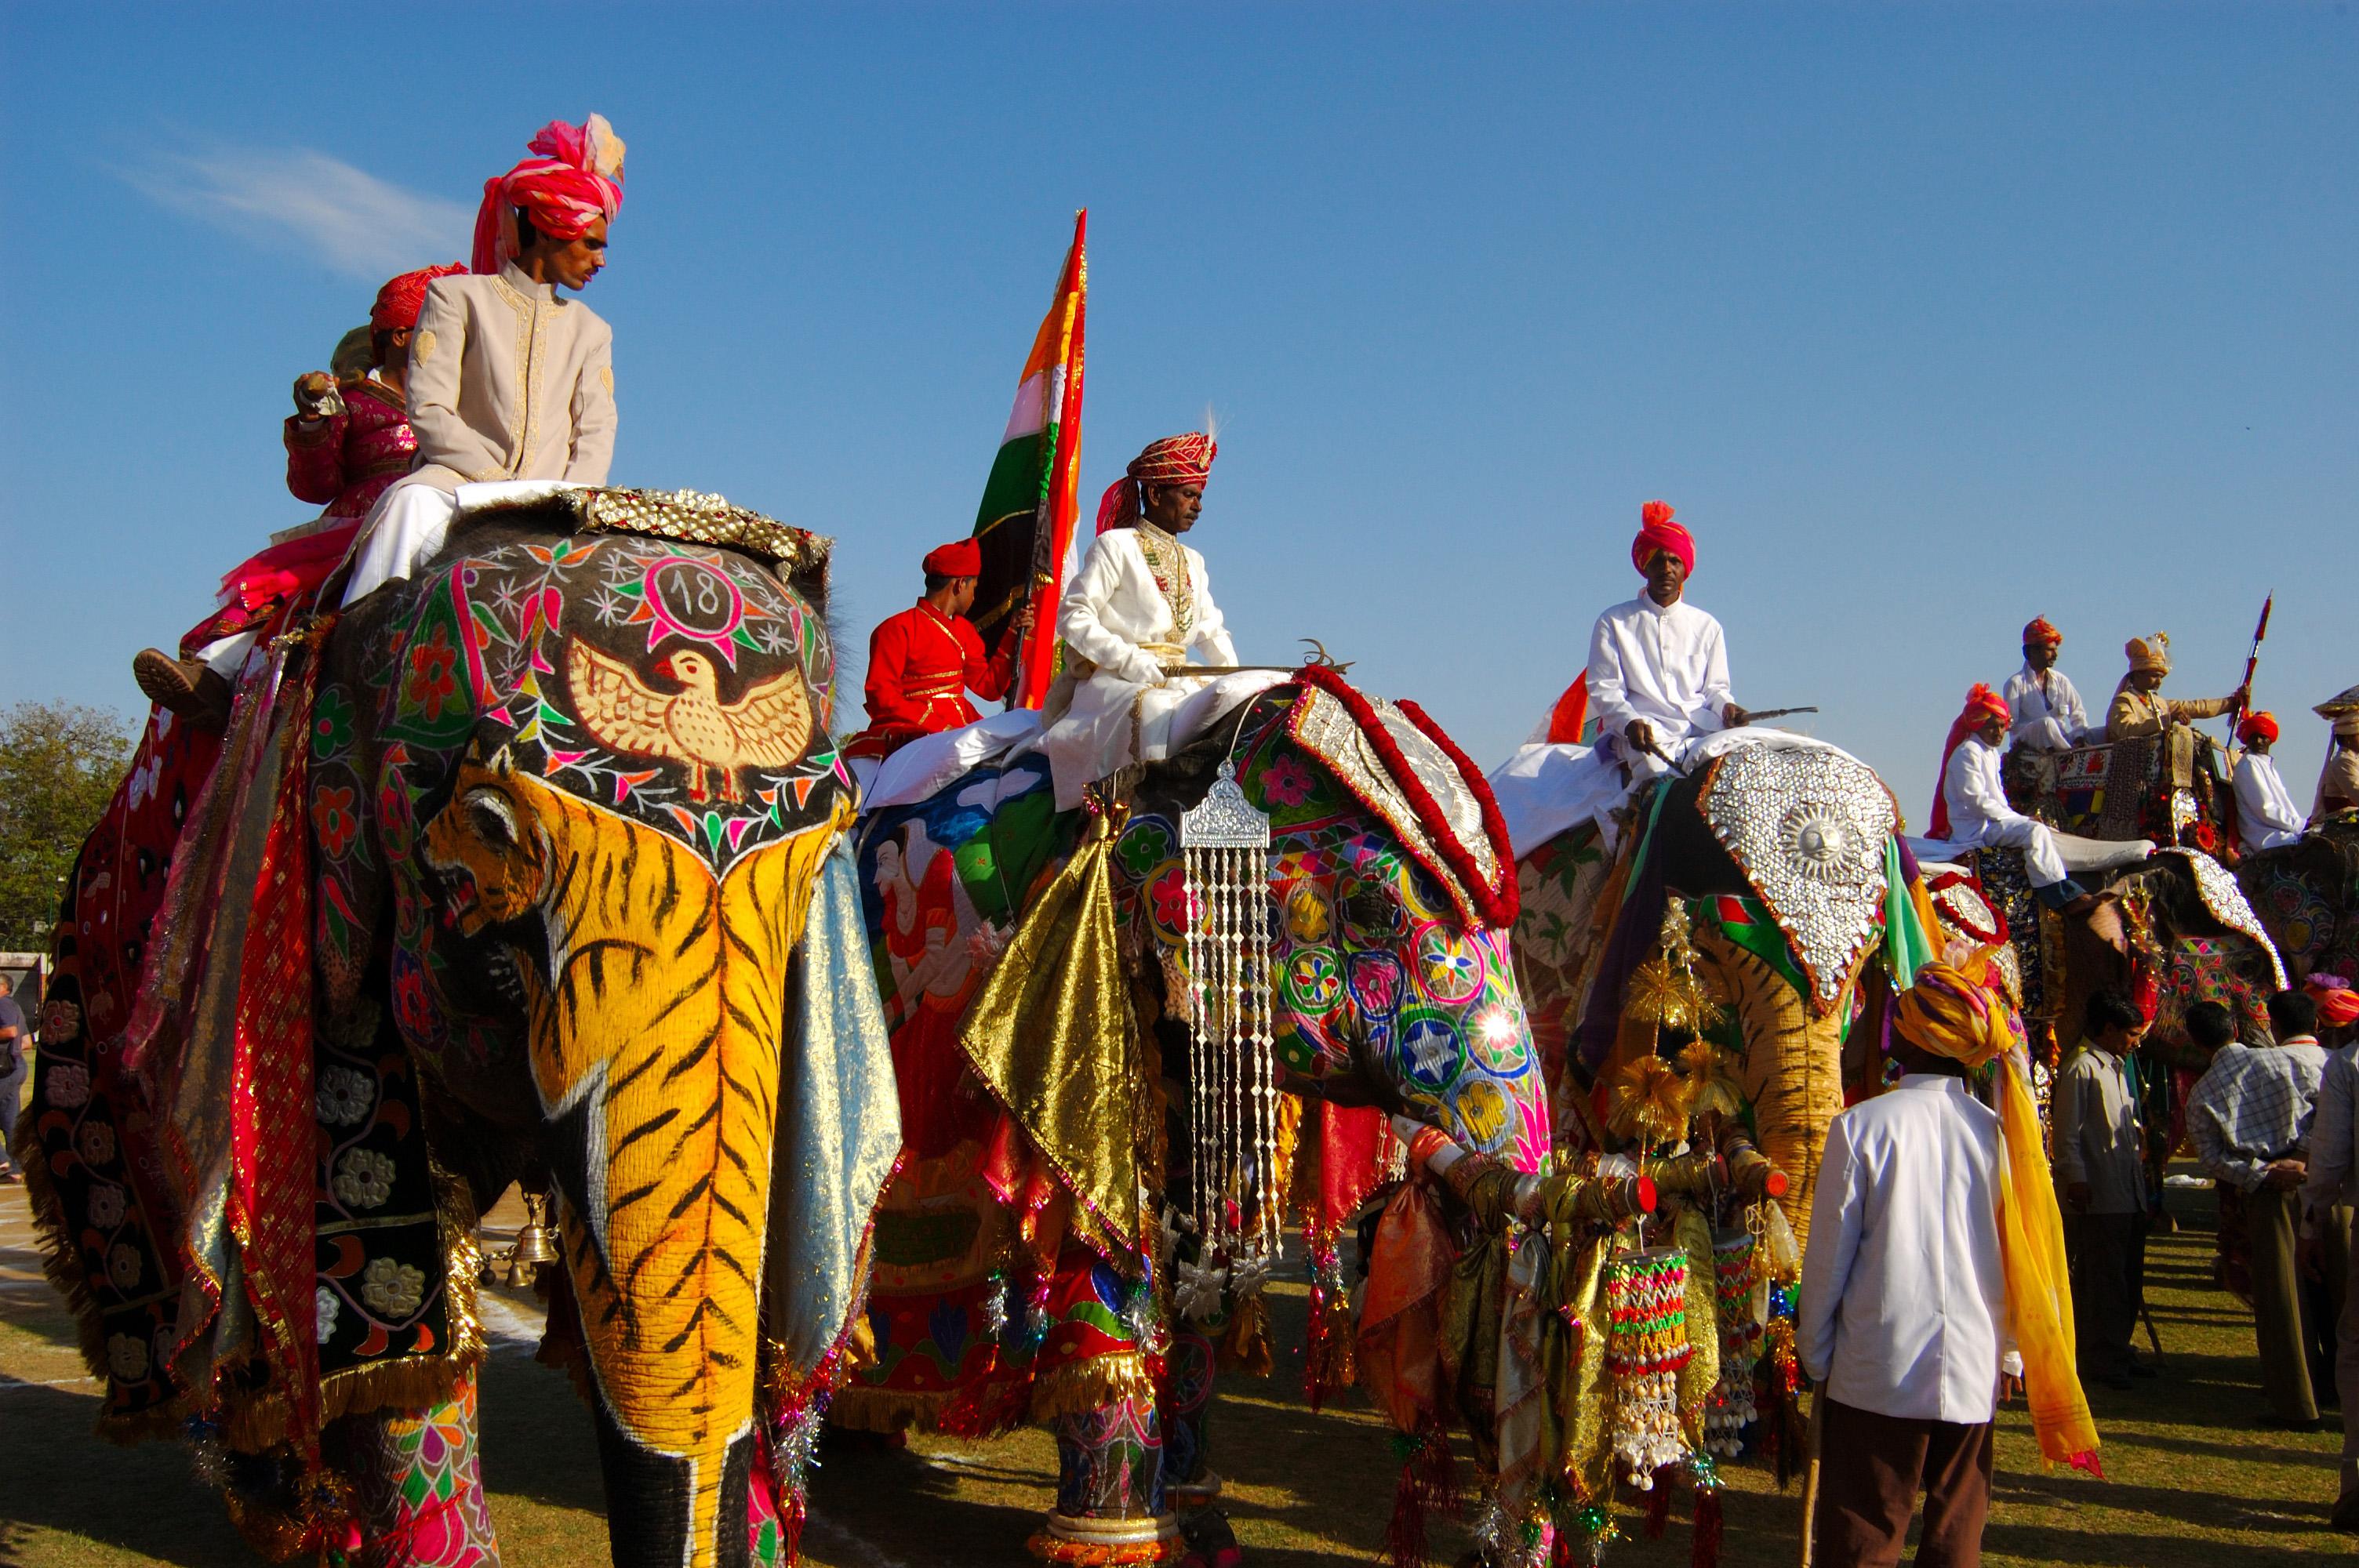 Jaipur Elephant Festival 2